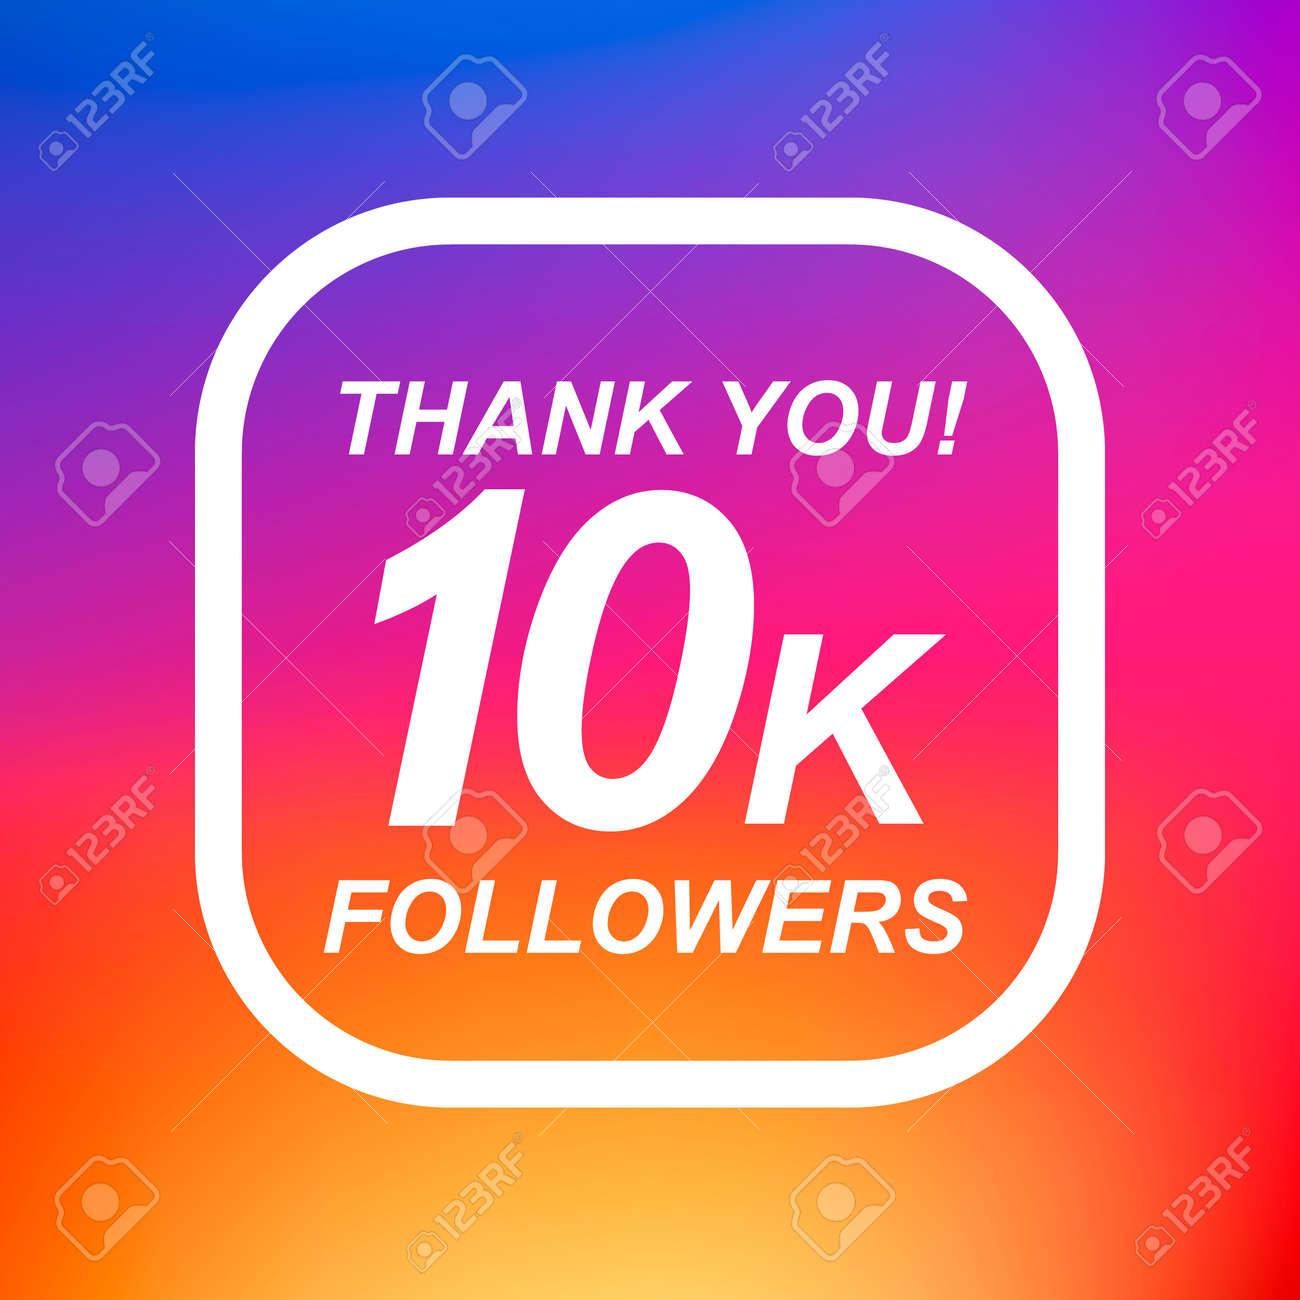 thank you 10k followers label design elements vector illustration